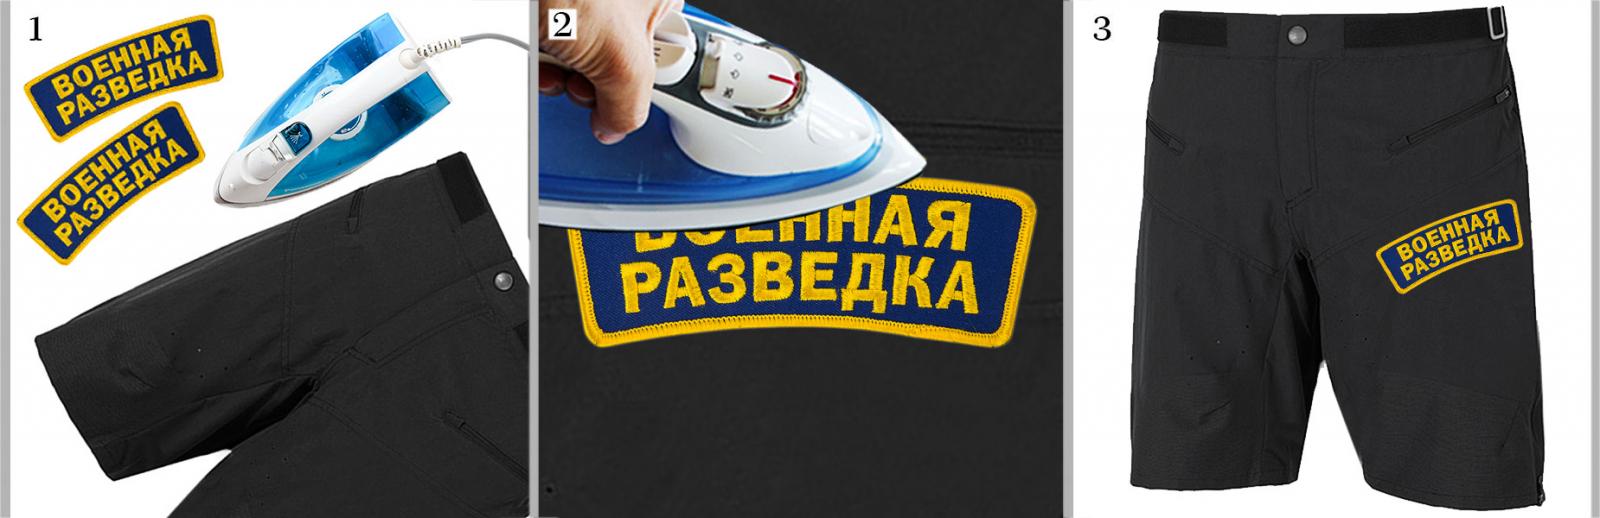 "Нашивка ""Военная разведка"" термоклеевая на шортах"